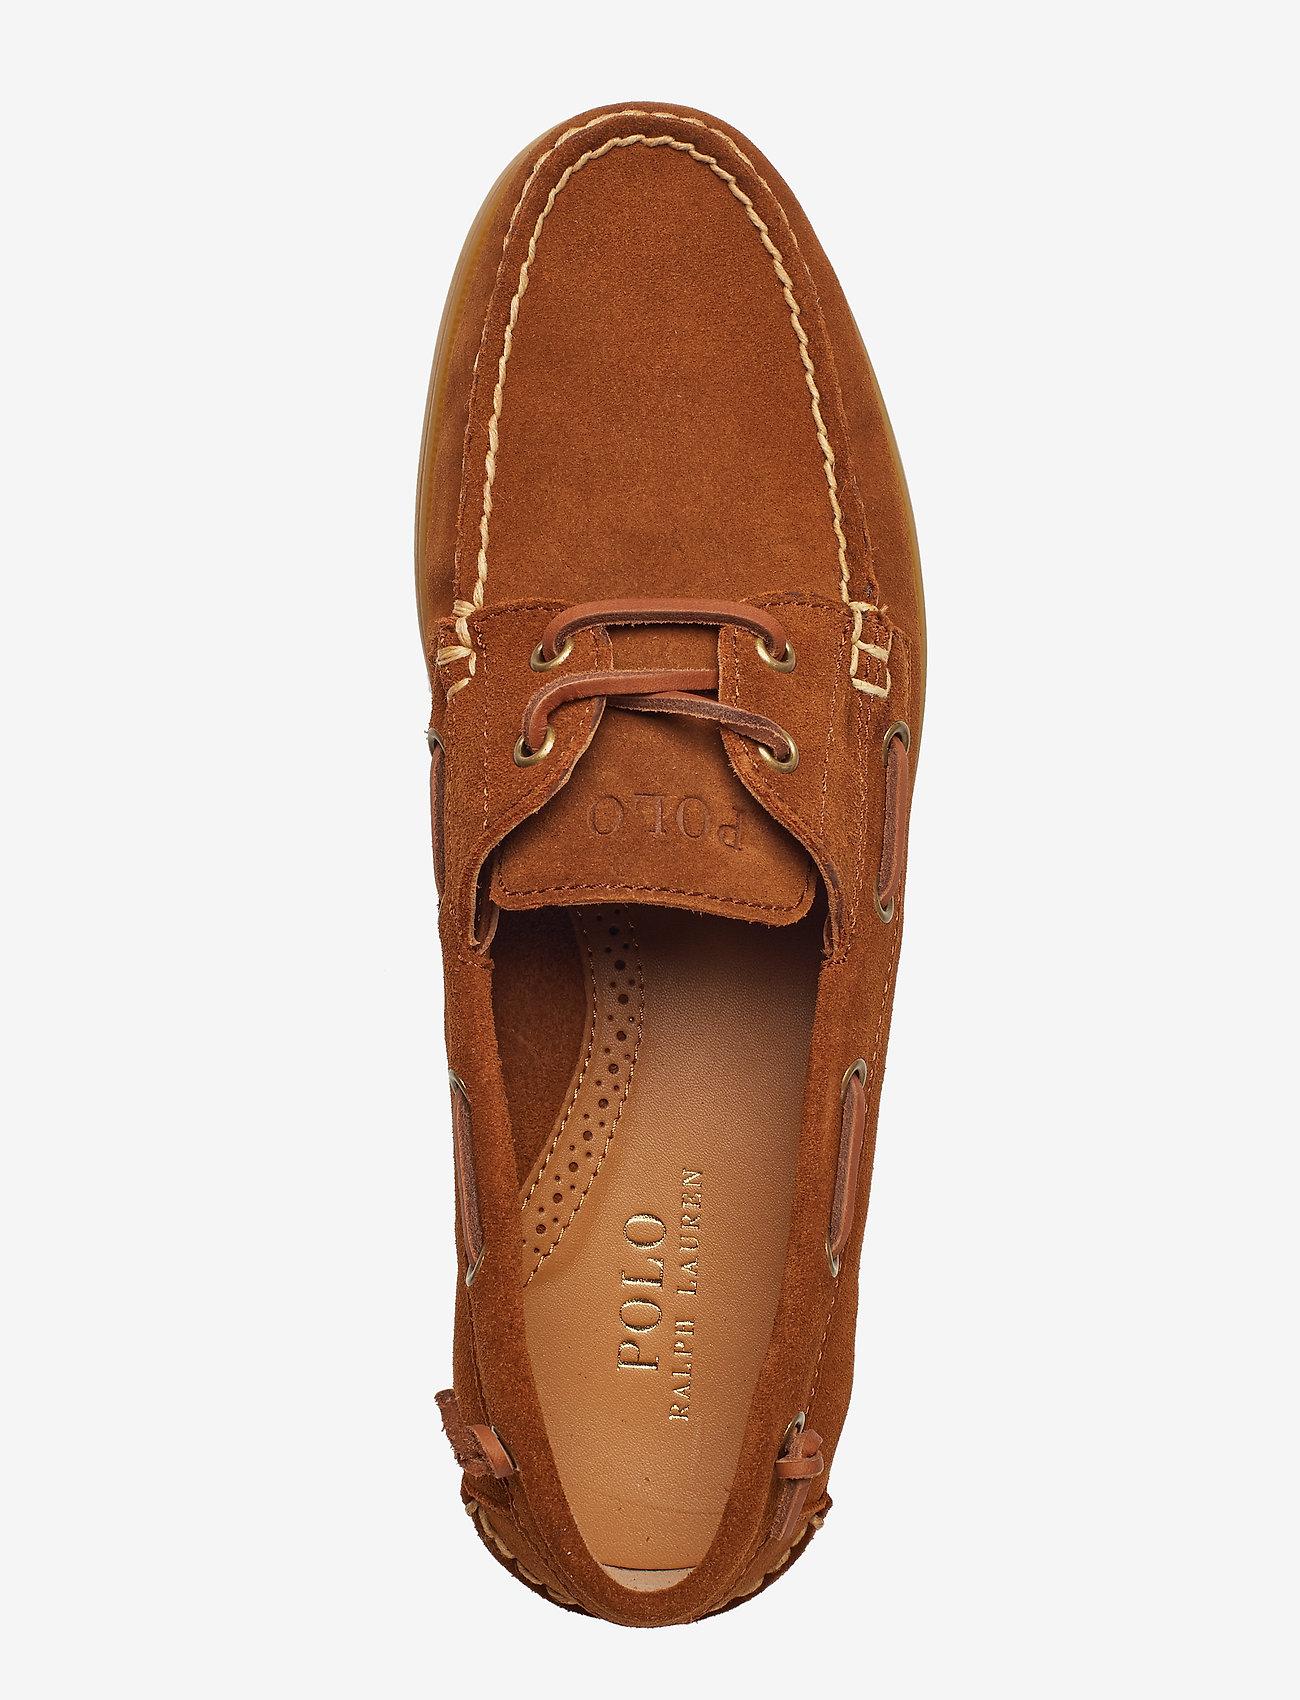 Merton Suede Boat Shoe (New Snuff) - Polo Ralph Lauren